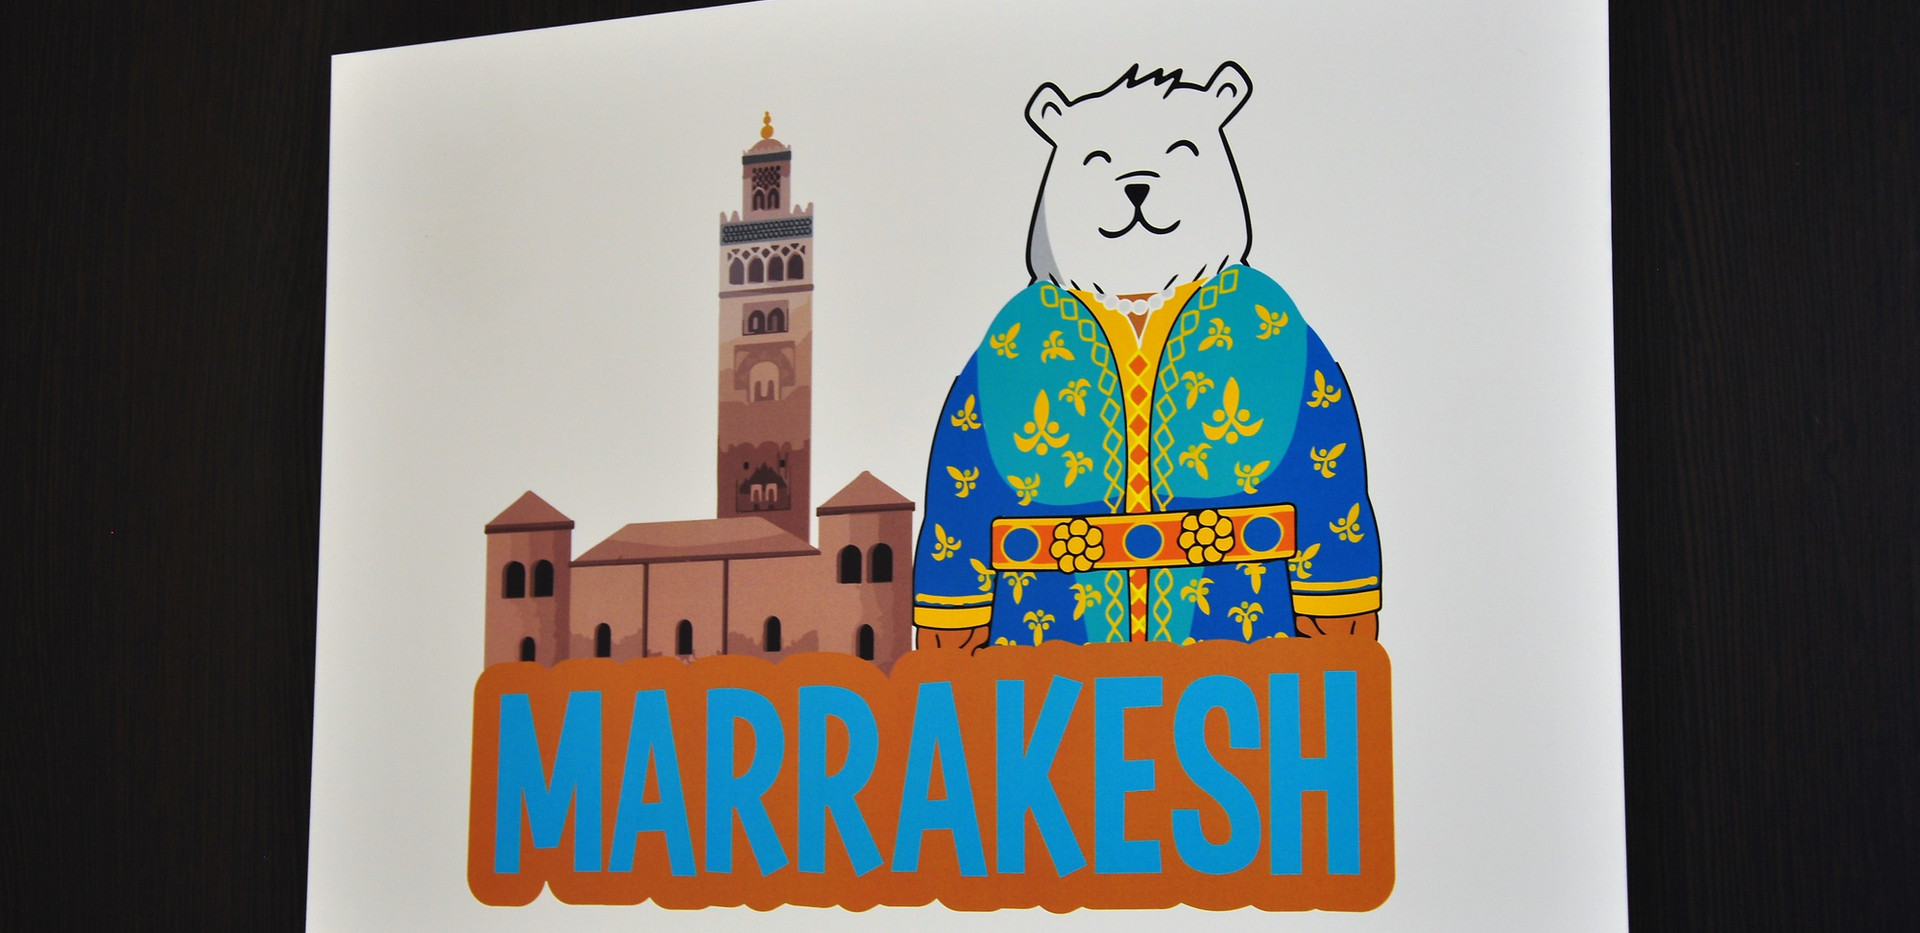 Marrakesh Dorm Signage.jpg